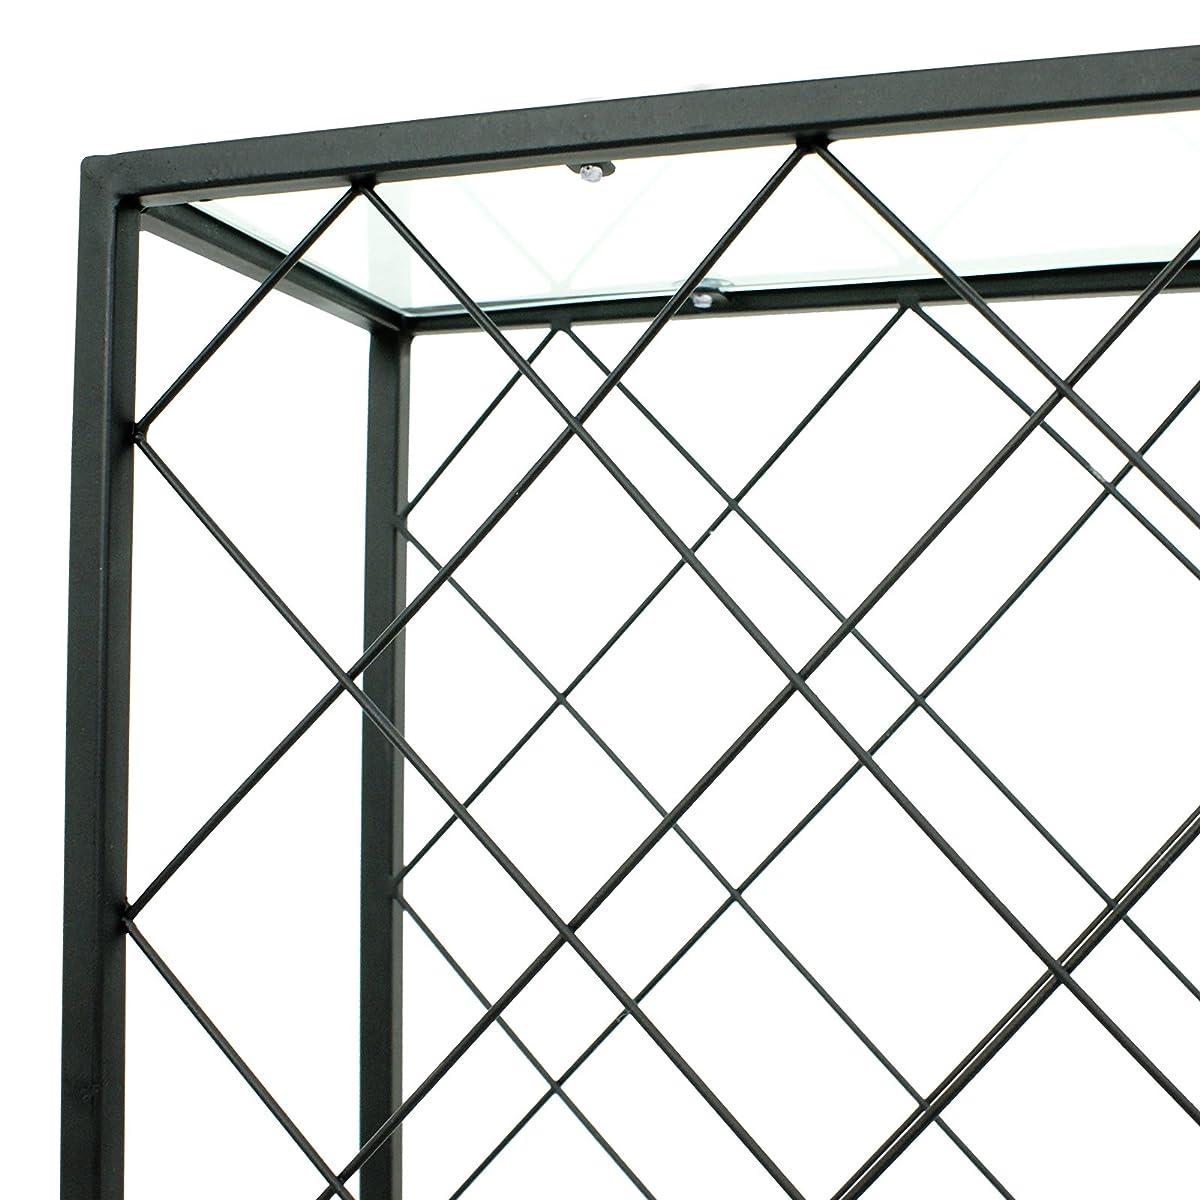 F2C 32 Bottles Wine Rack Holders Stands Liquor Storage Corner Wine Cabinet with Glassy Table Top, Metal Construction, Black